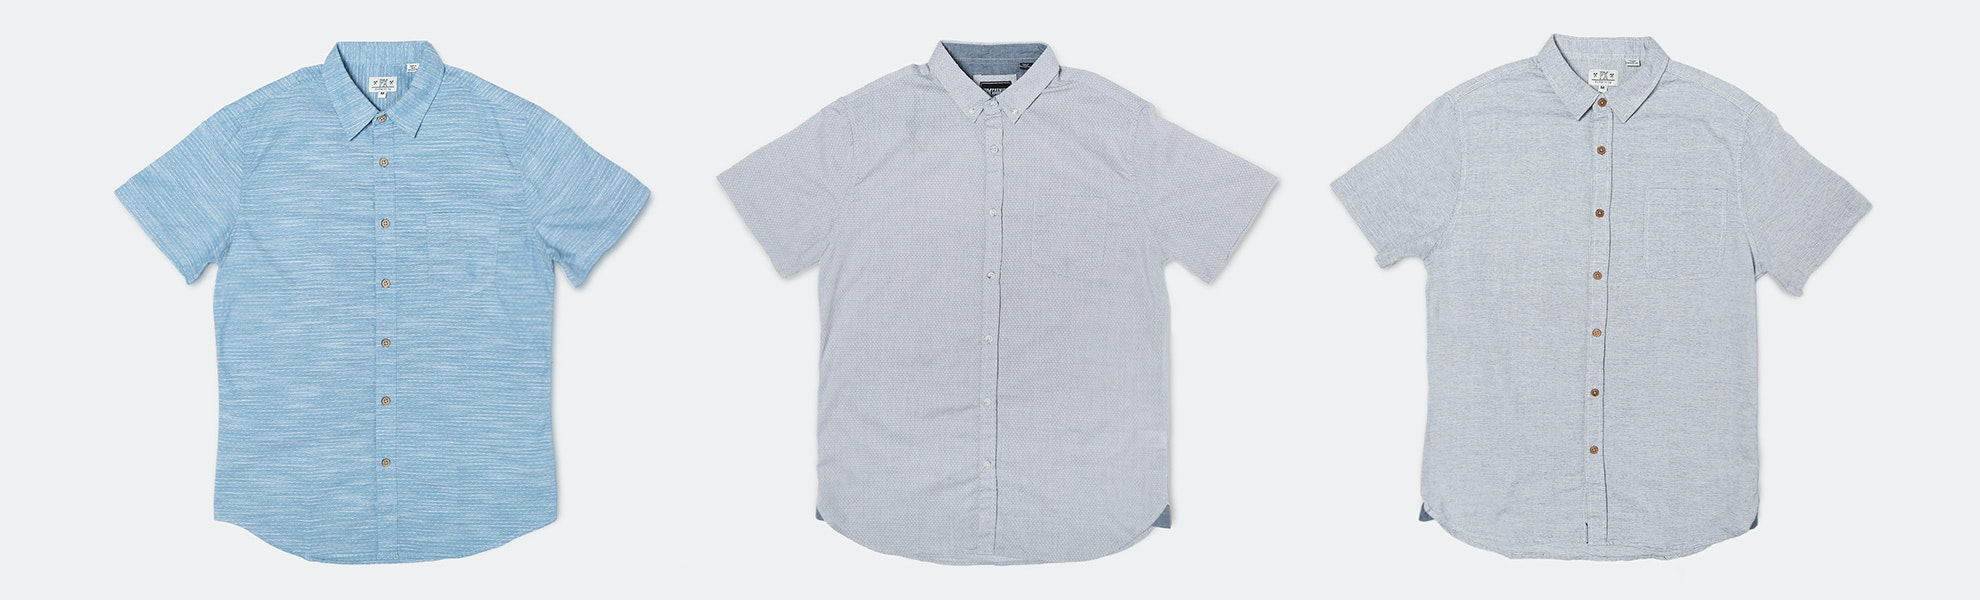 PX Clothing Micro-Print Woven Shirts